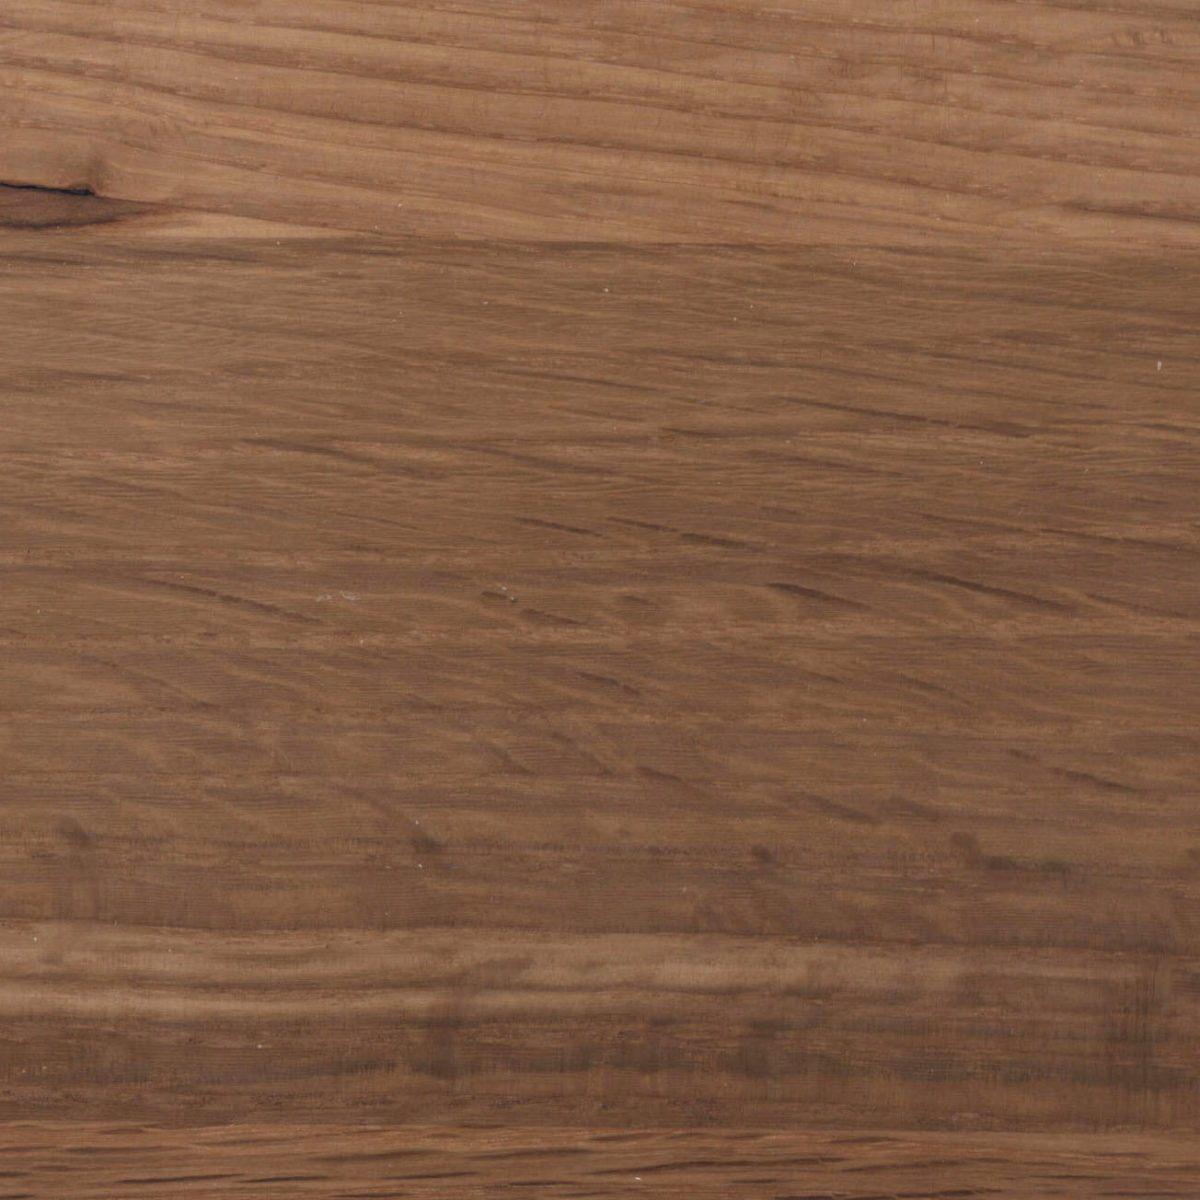 11 Quarter Sawn White Oak Wood Sample